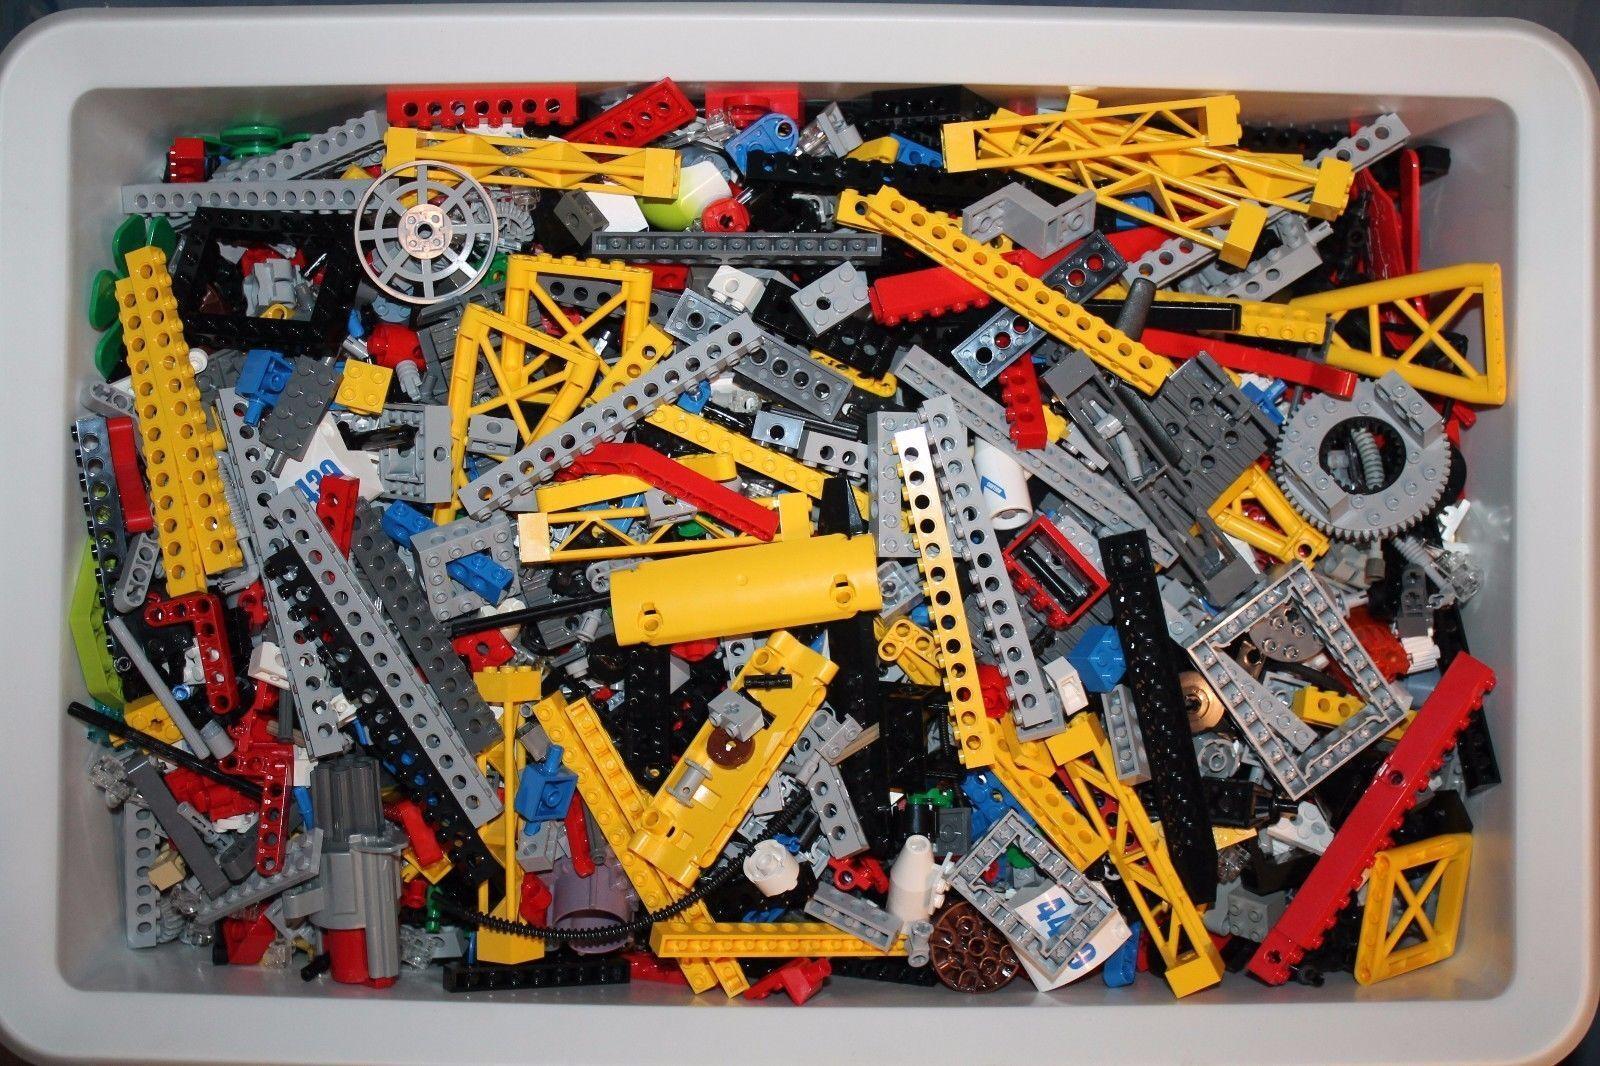 250 Teile Lego Technik Technic Zahnräder Liftarme Pins Stopper Zylinder Reifen